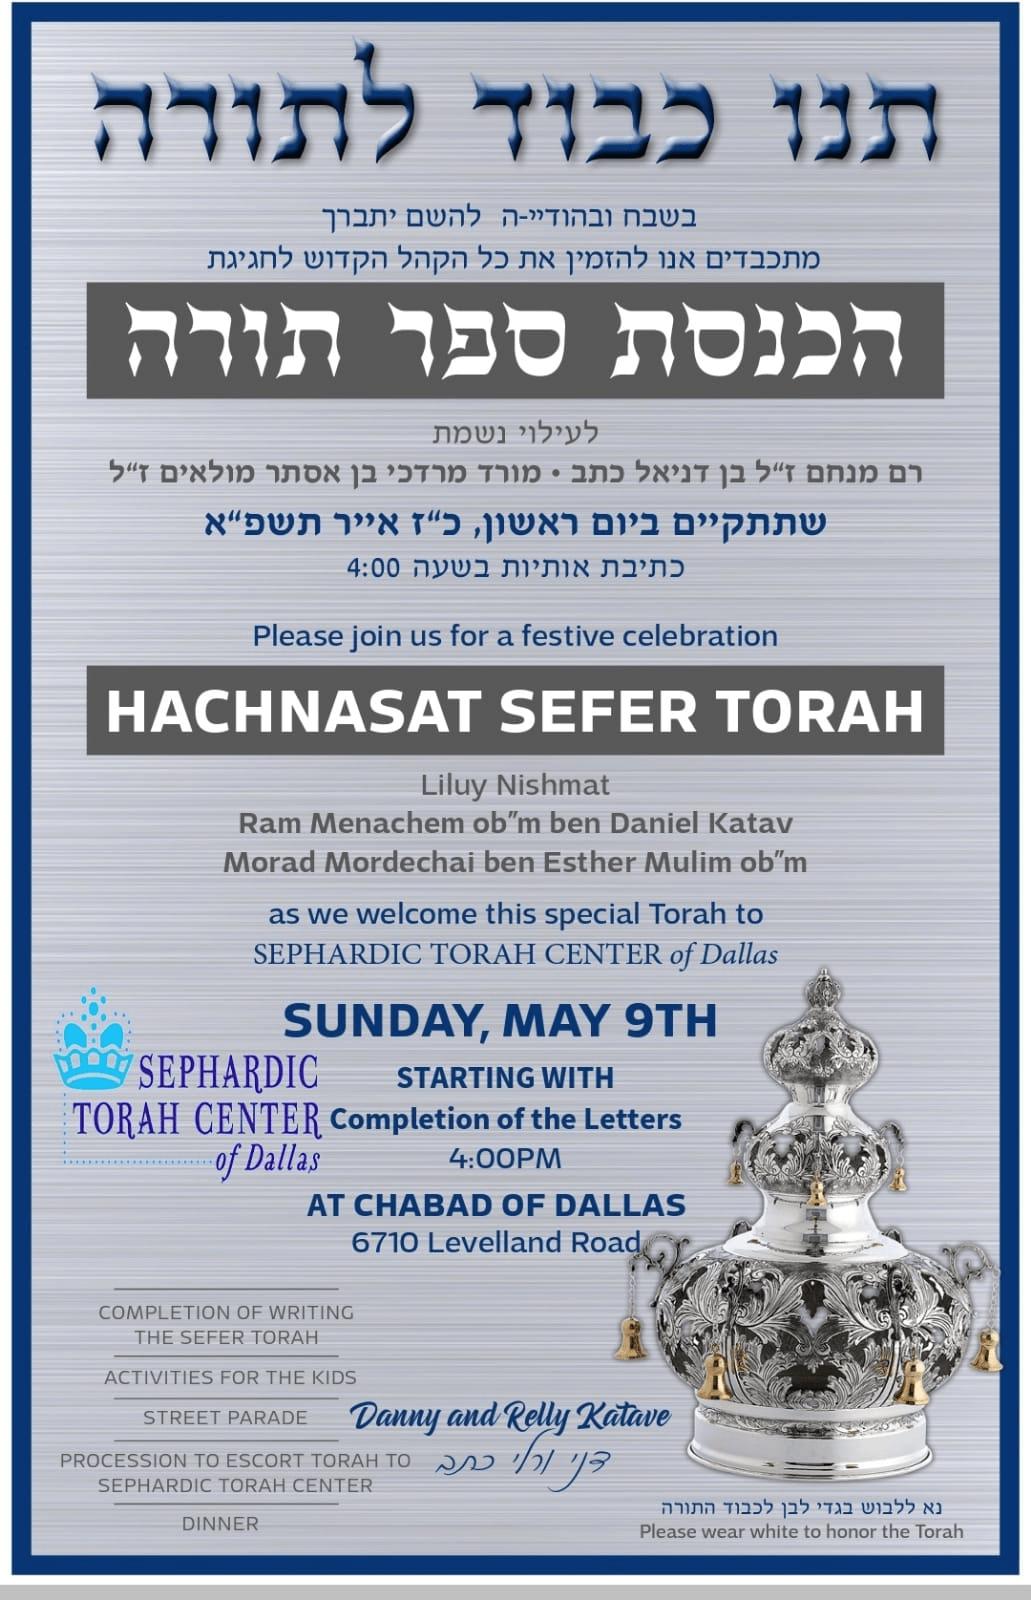 Exciting Event: Hachnassat Sefer Torah This Sunday 1